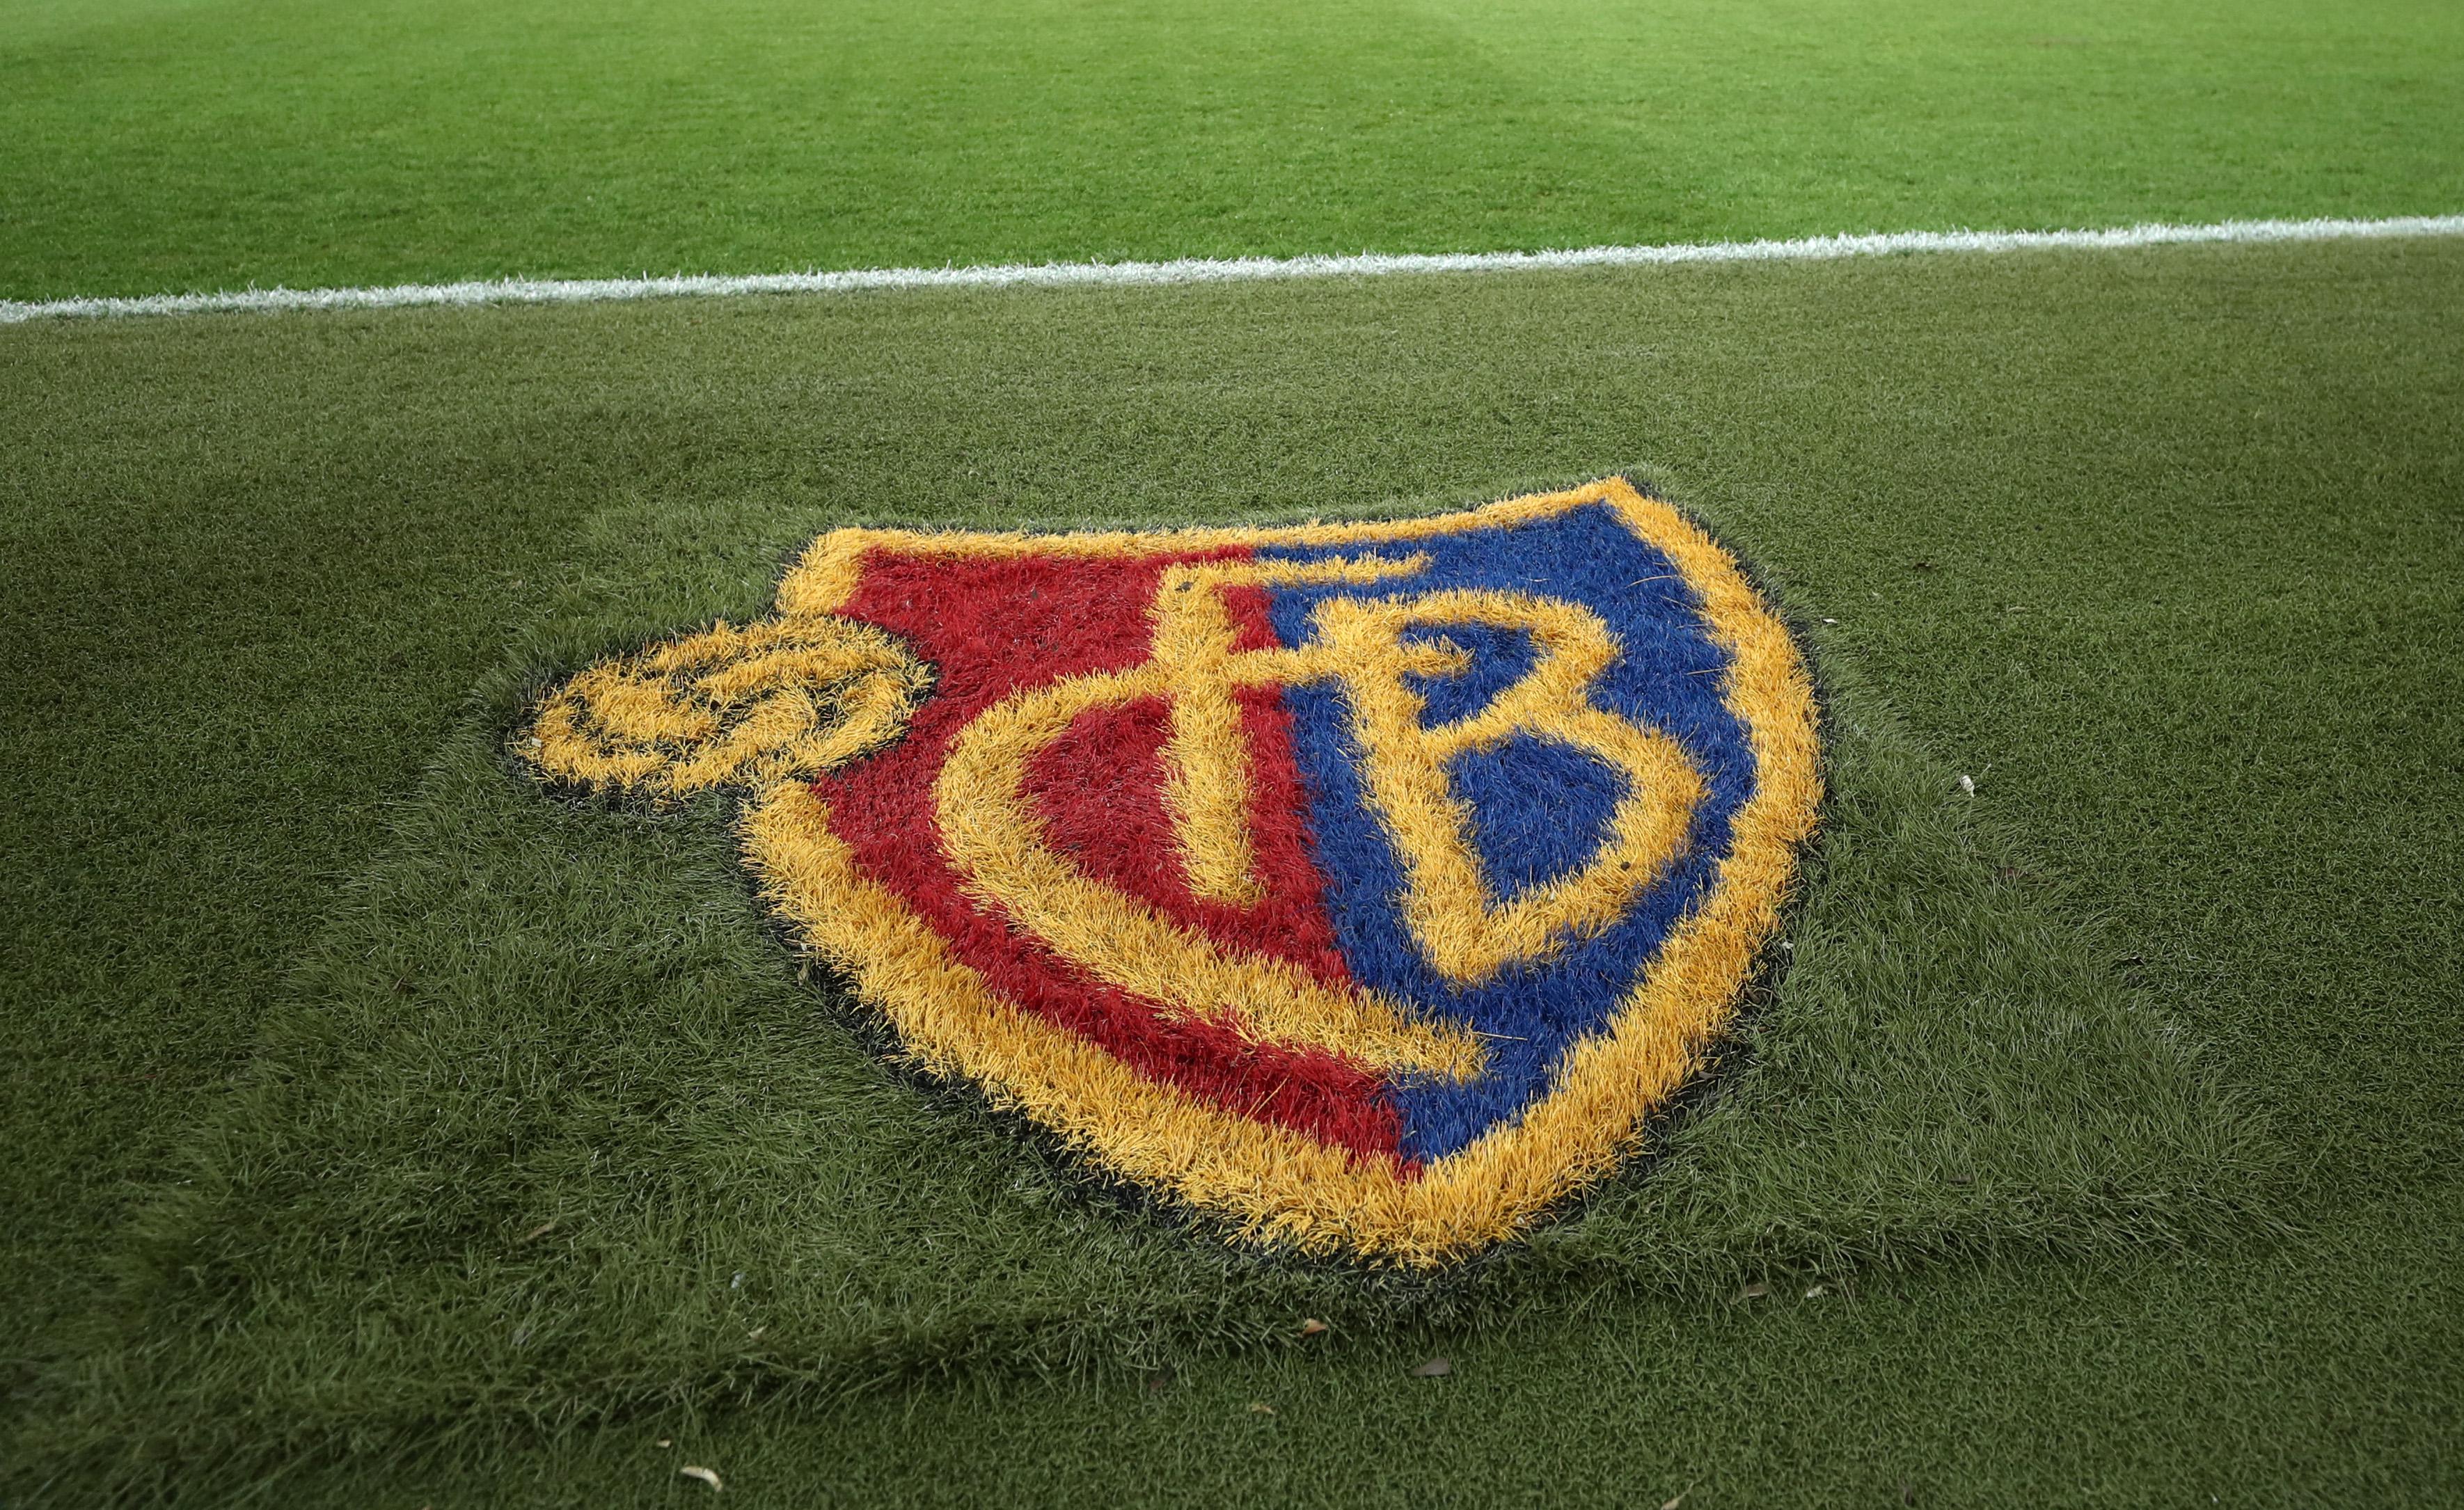 Everton linked to FC Basel defender Eray Comert yet again